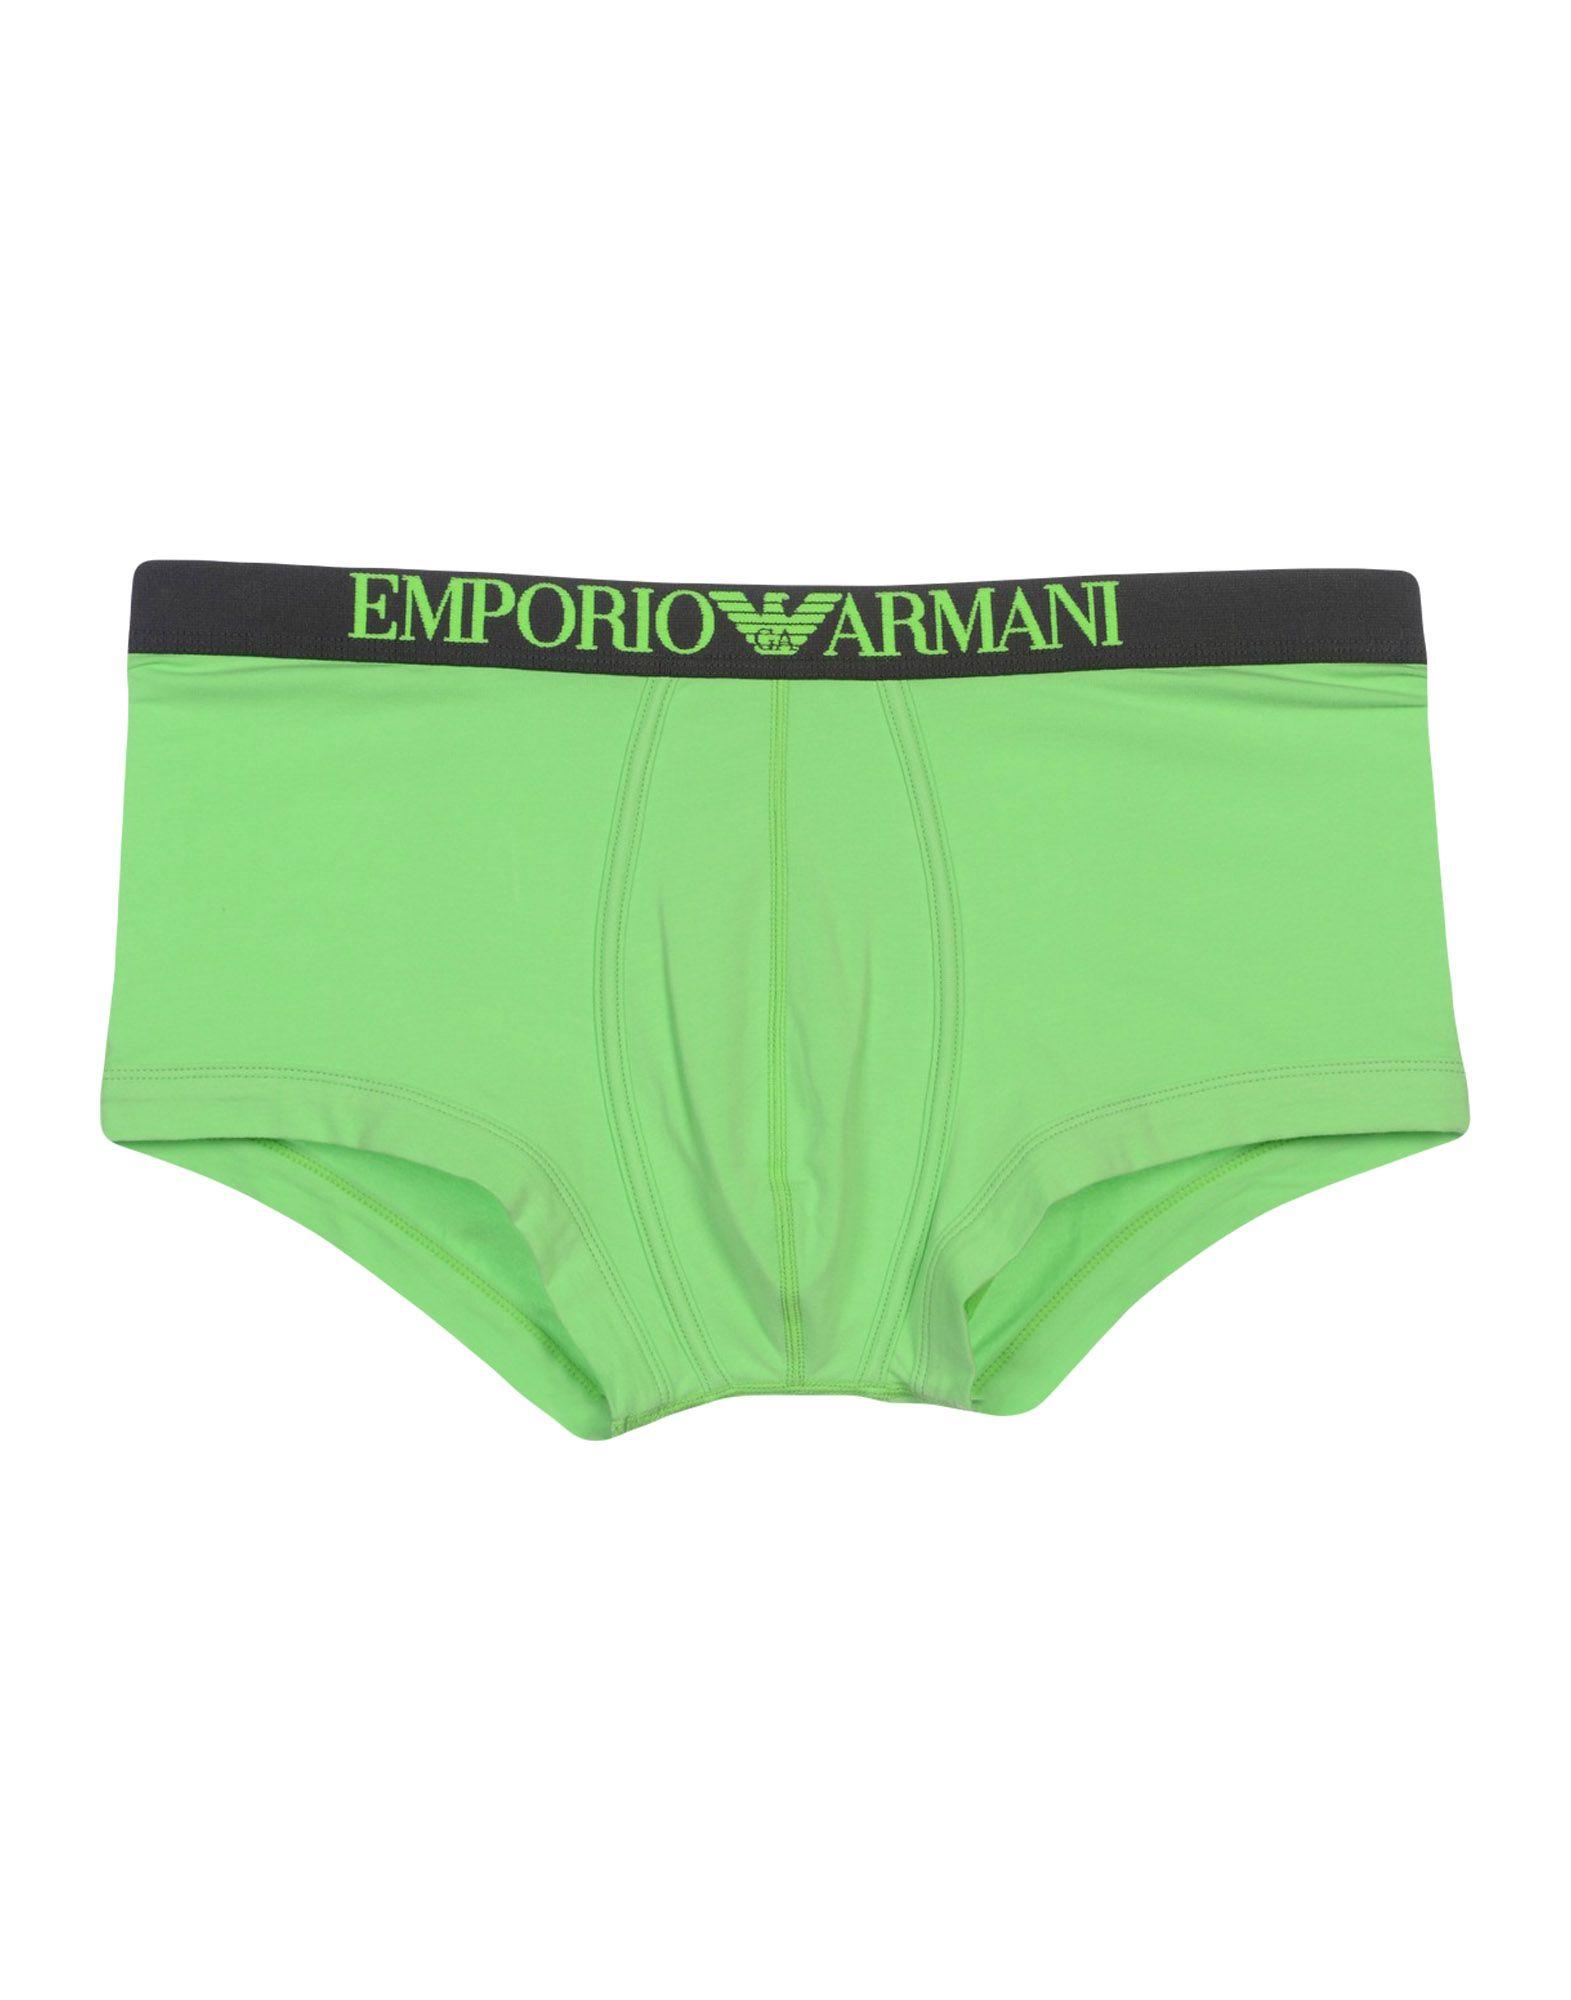 Emporio Armani Underwear Boxers